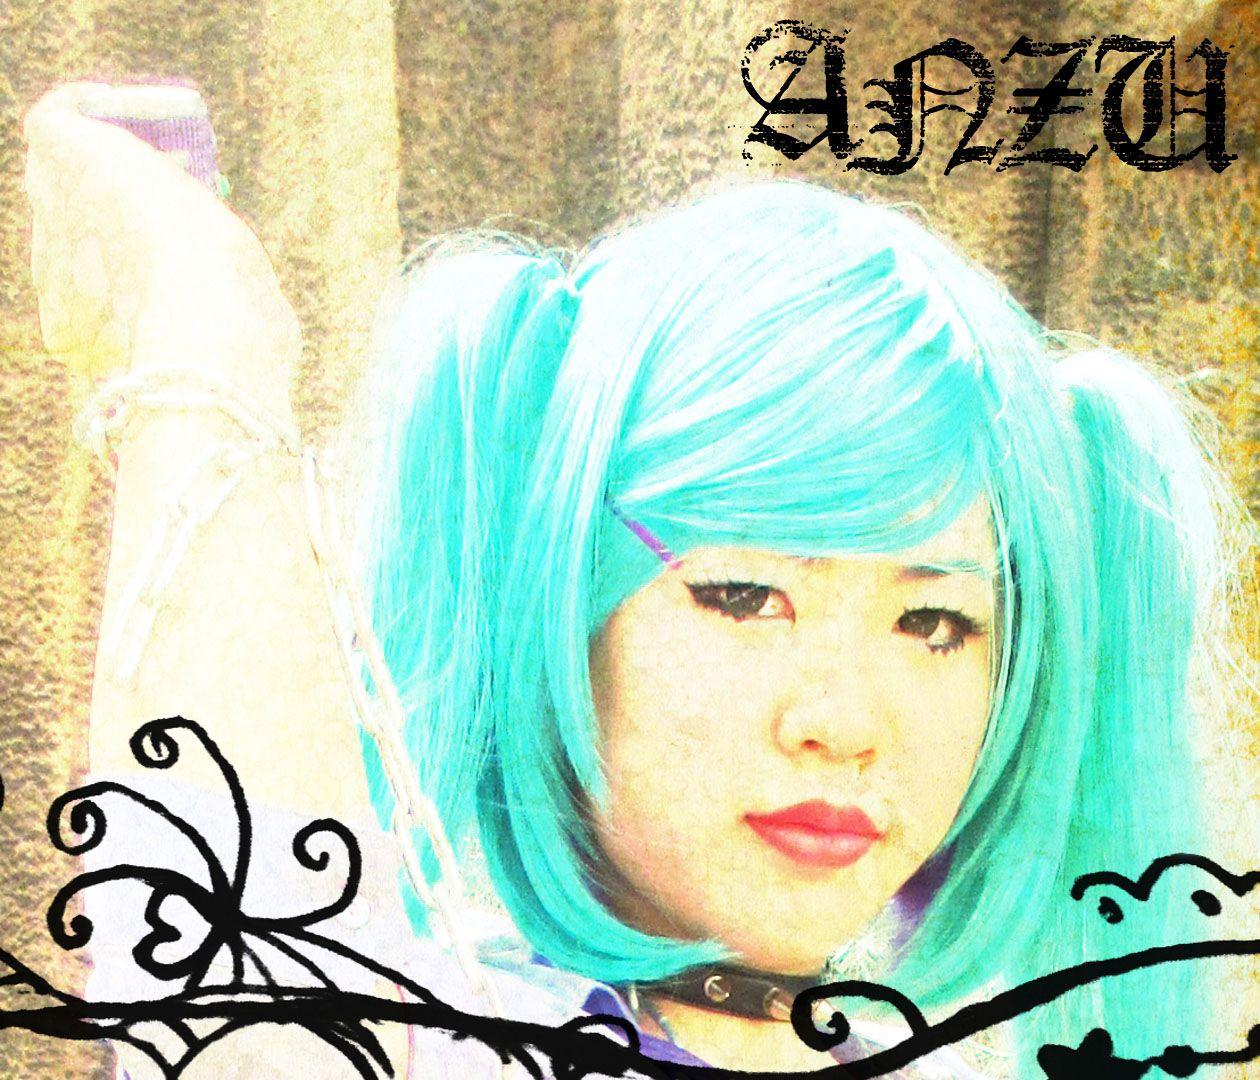 Hatsune miku cosplay. Photo by me